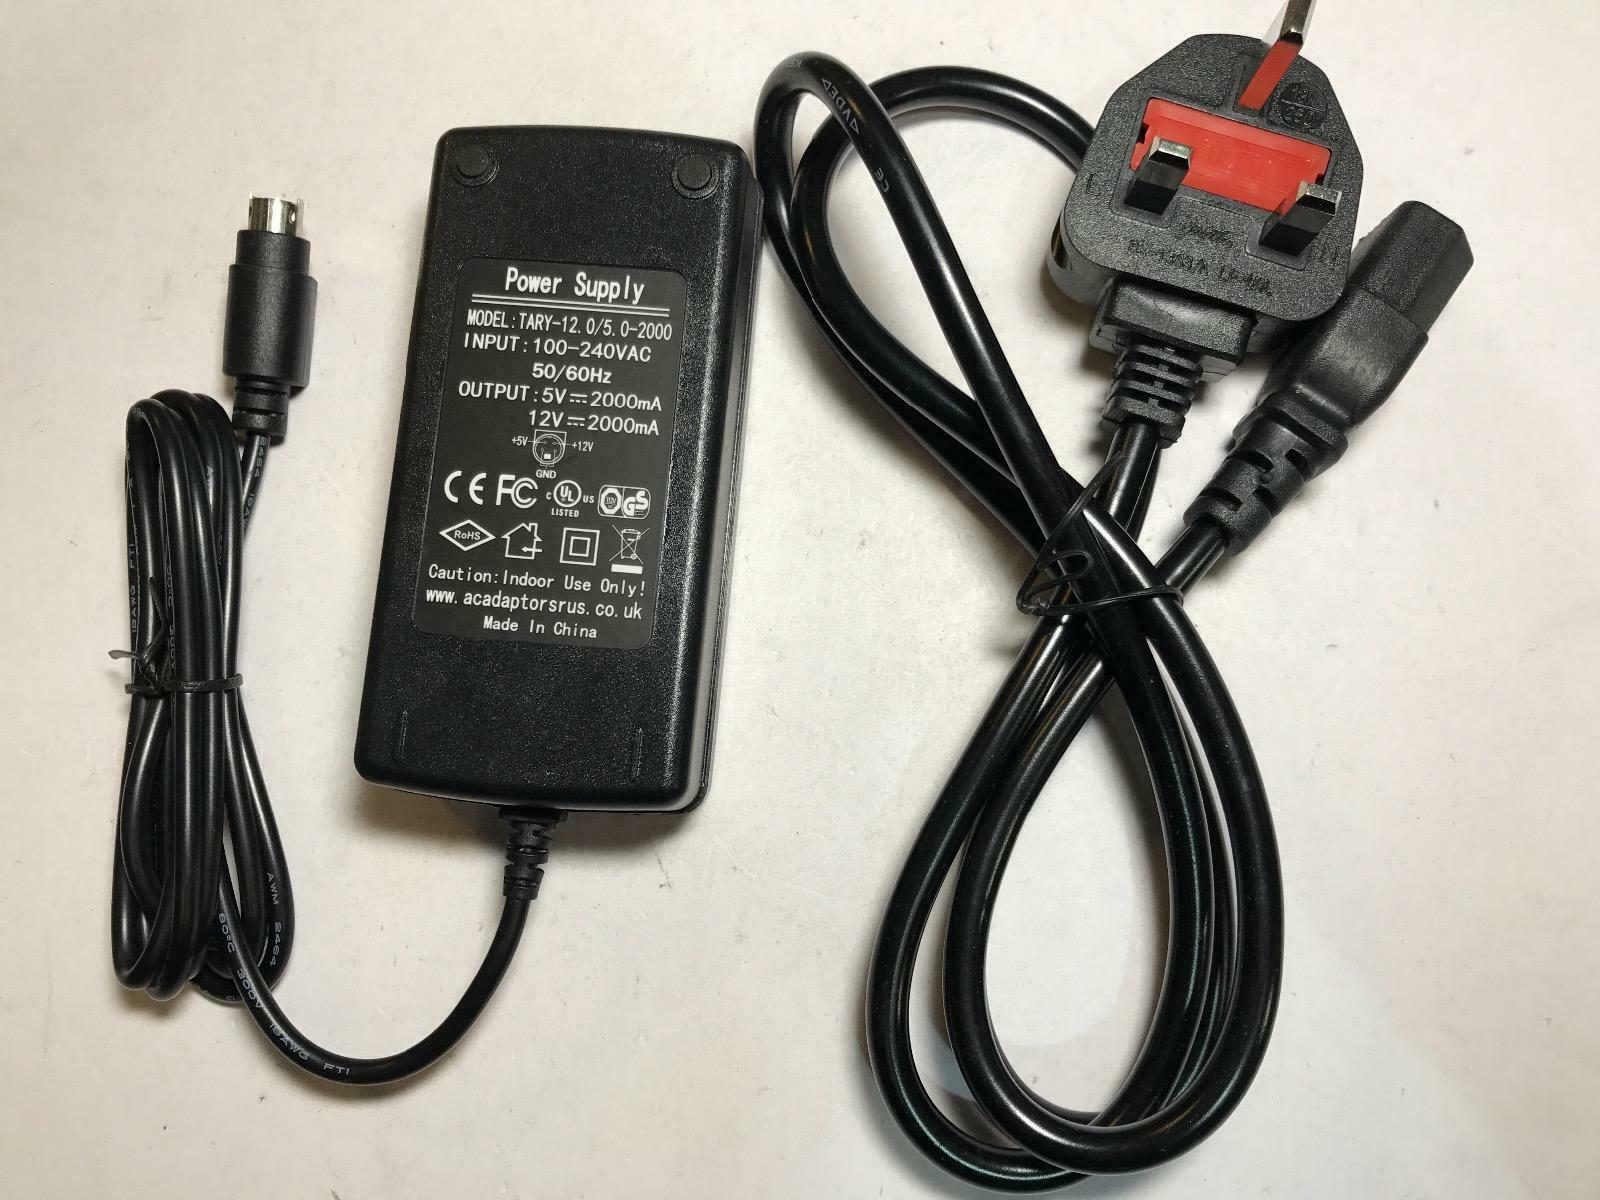 UK +5V +12V GND 4 Thin Pin Power Supply AC-DC Adaptor model TARY-12.0/5.0-2000